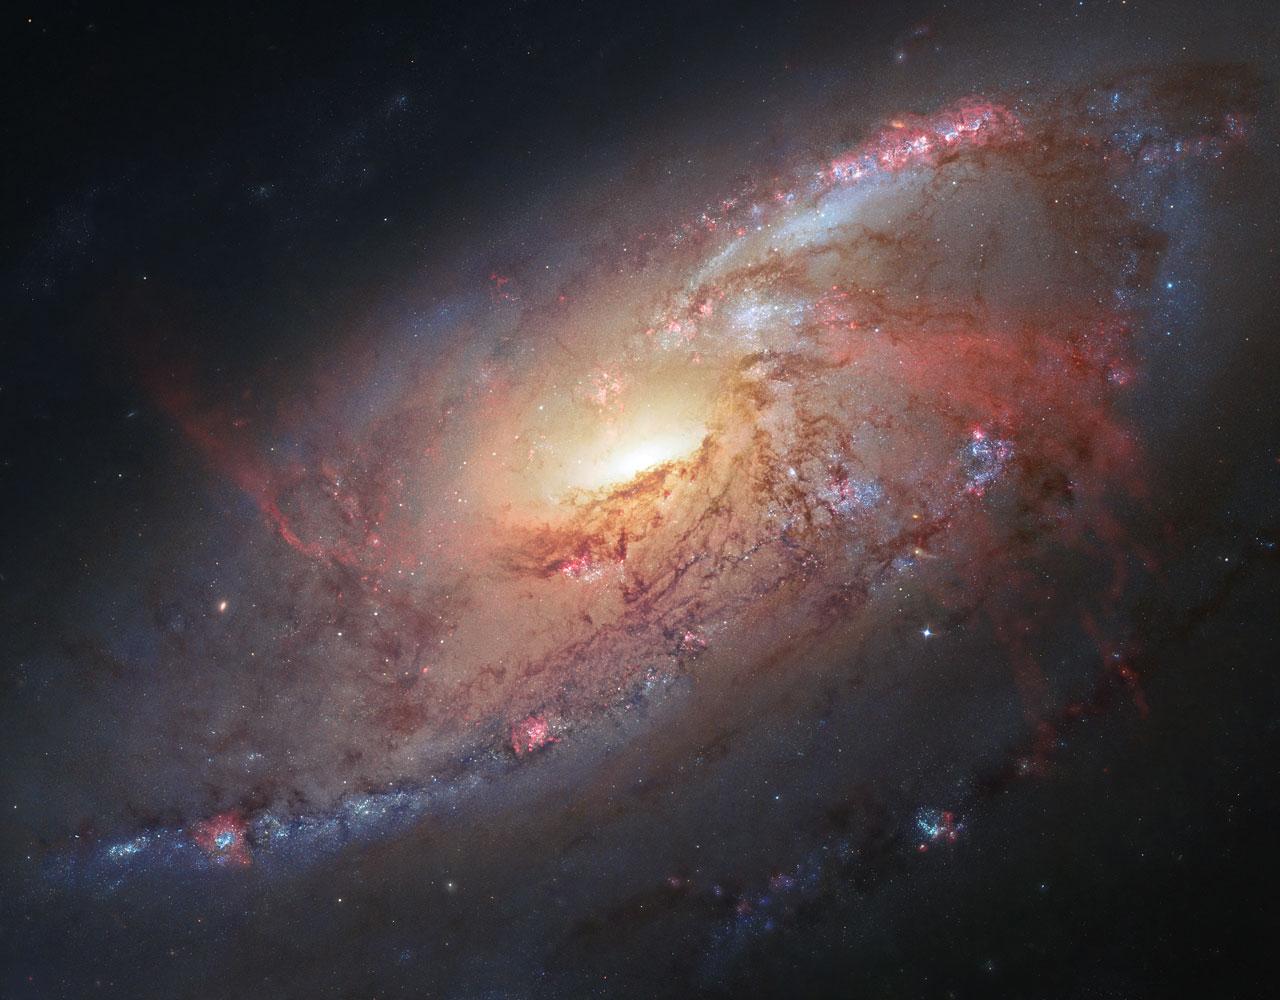 Orbiterch Space News A spiral galaxy with a secret